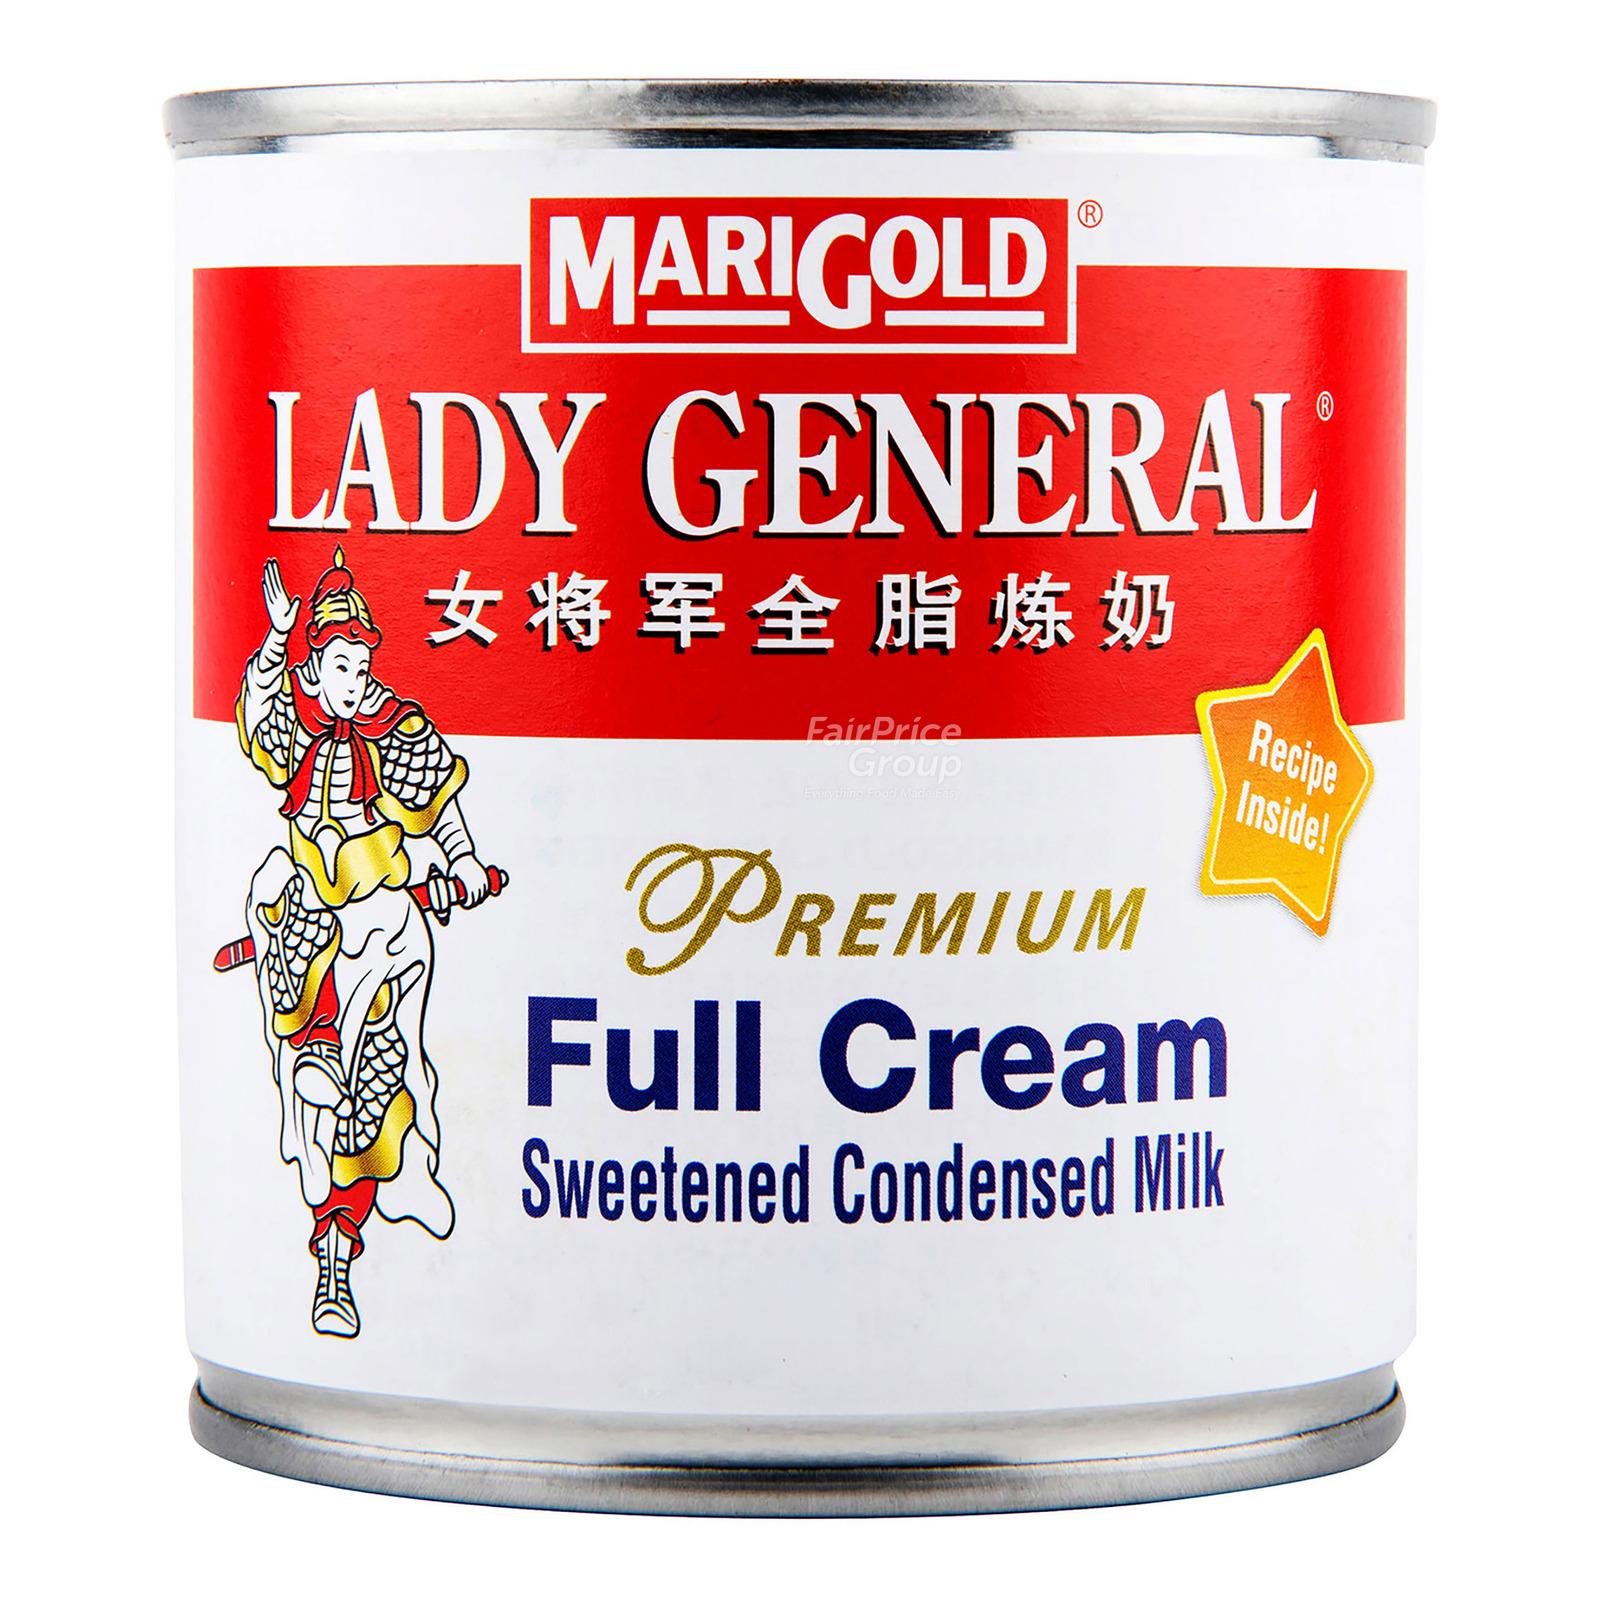 Marigold Lady General Sweetened Condensed Milk - Full Cream